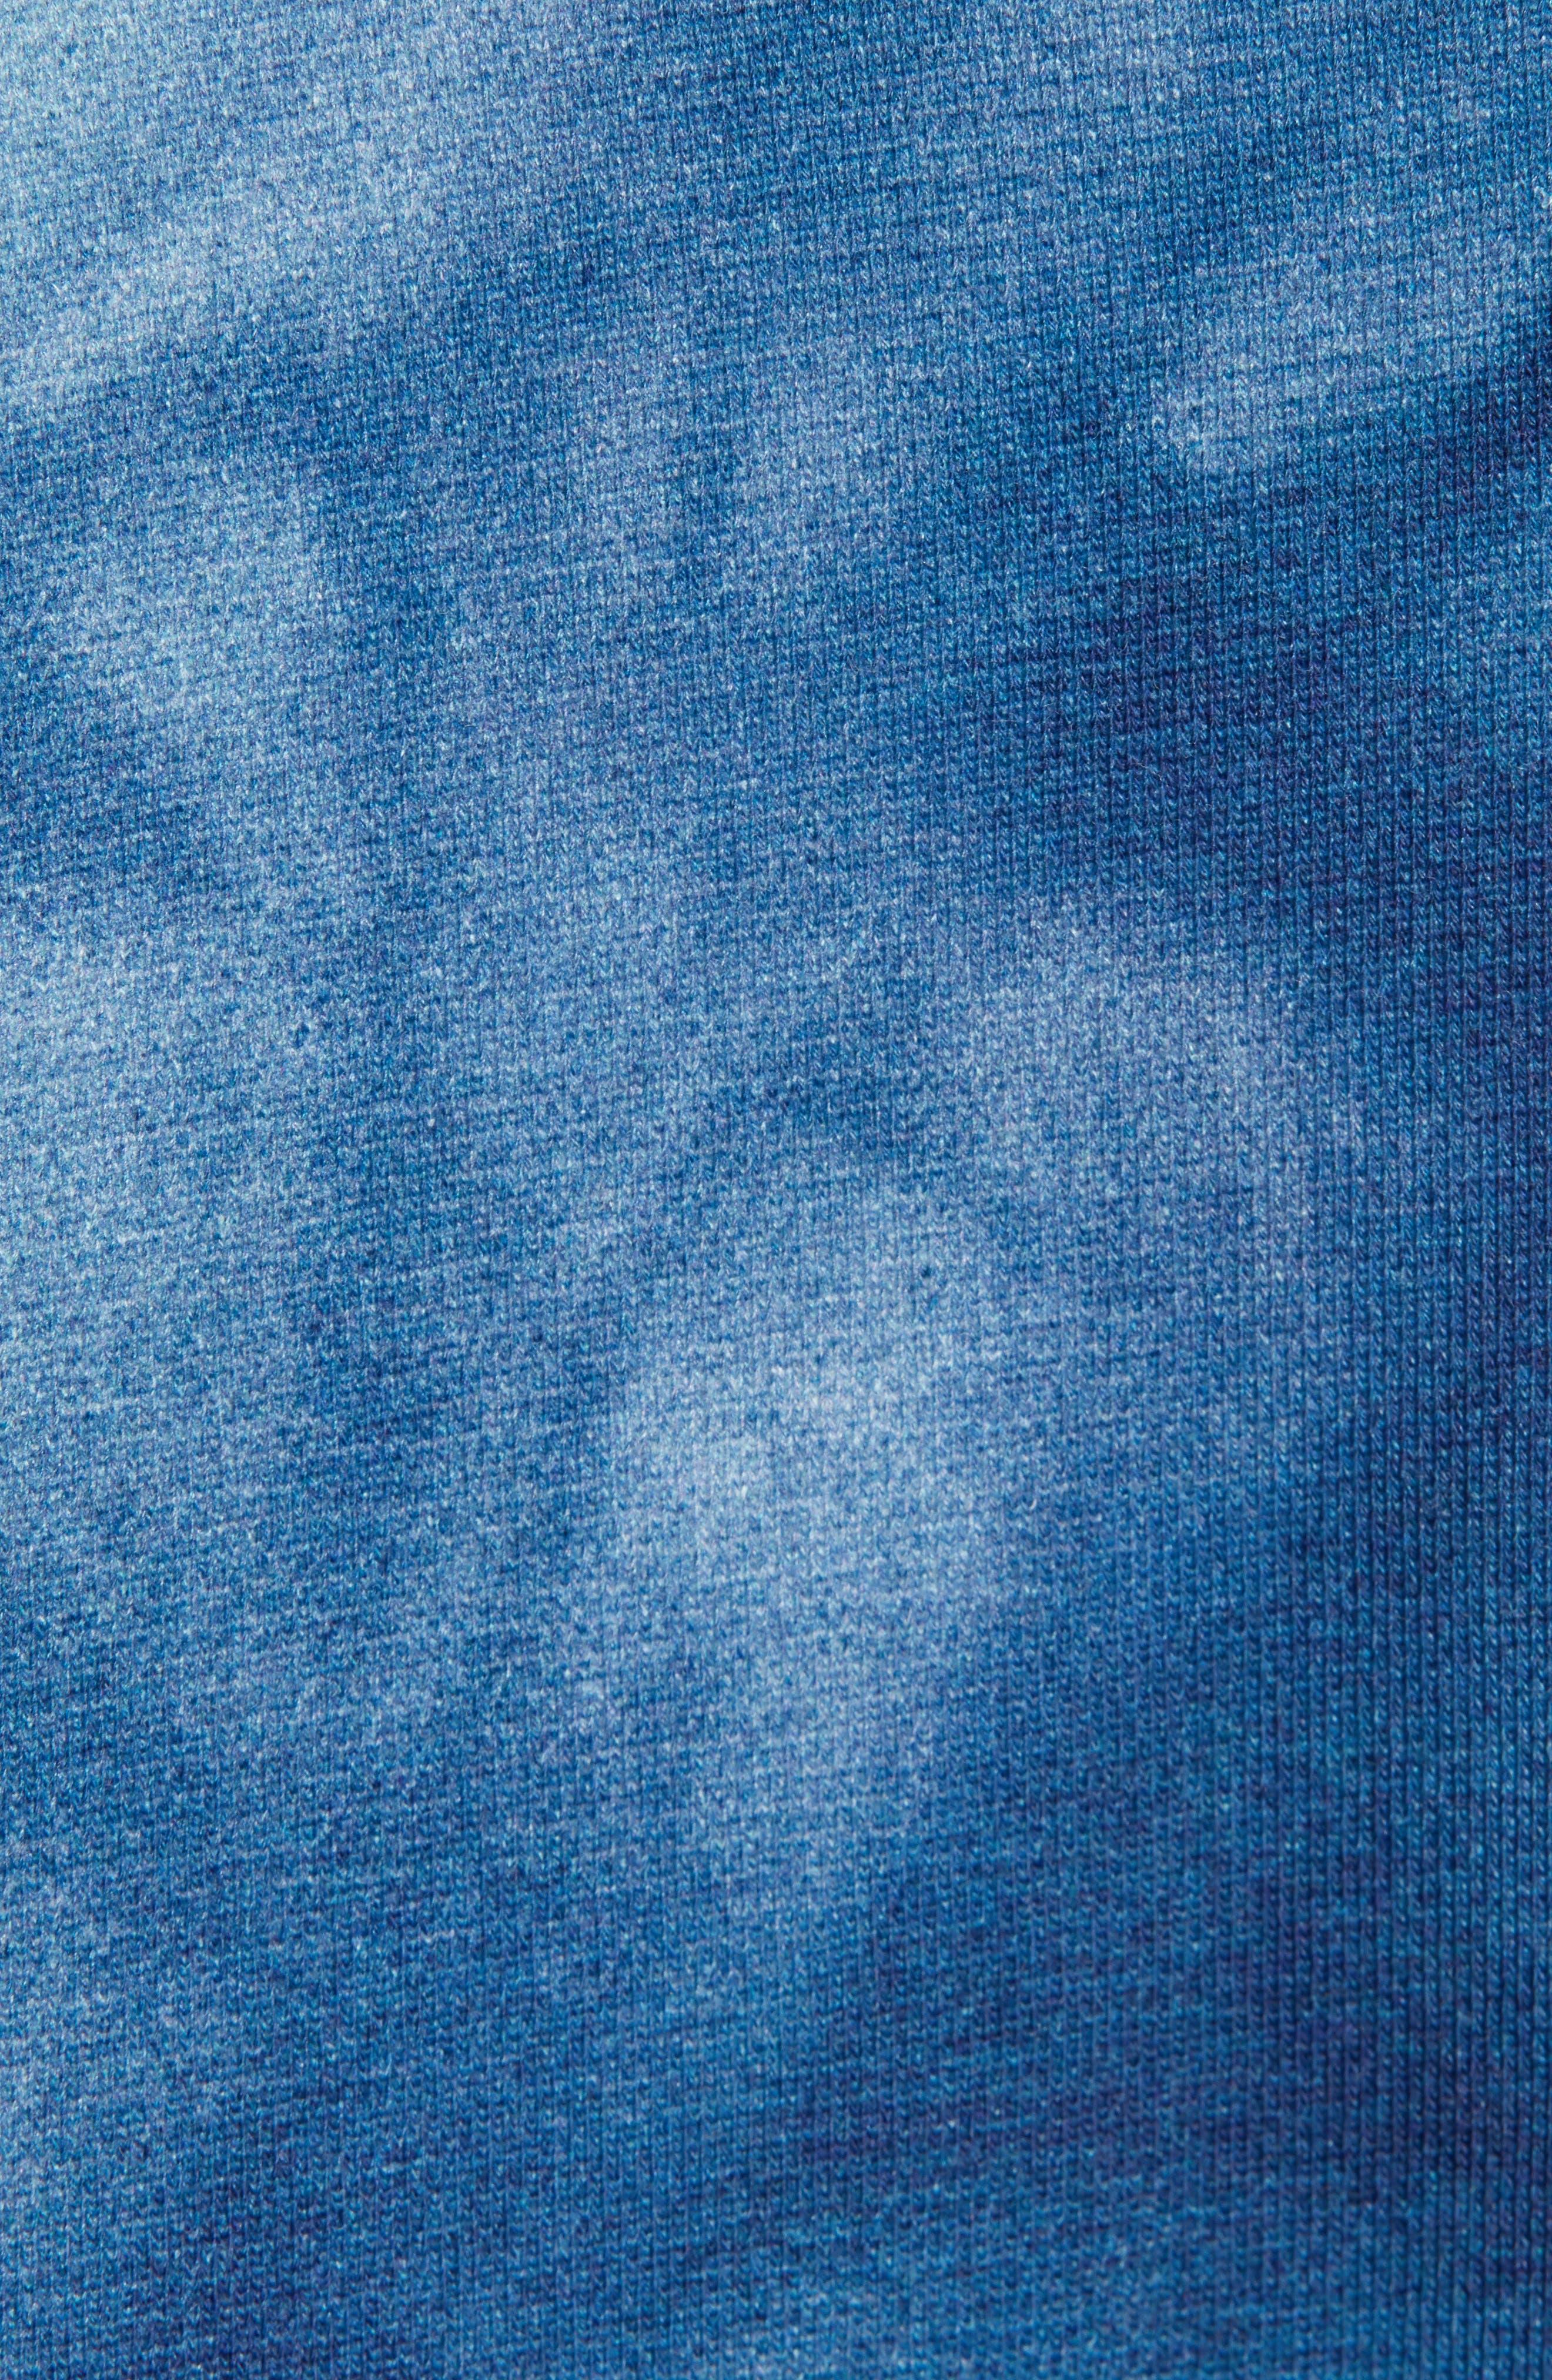 Cryrer Waterfall Hooded Sweatshirt,                             Alternate thumbnail 5, color,                             TEAL BLUE